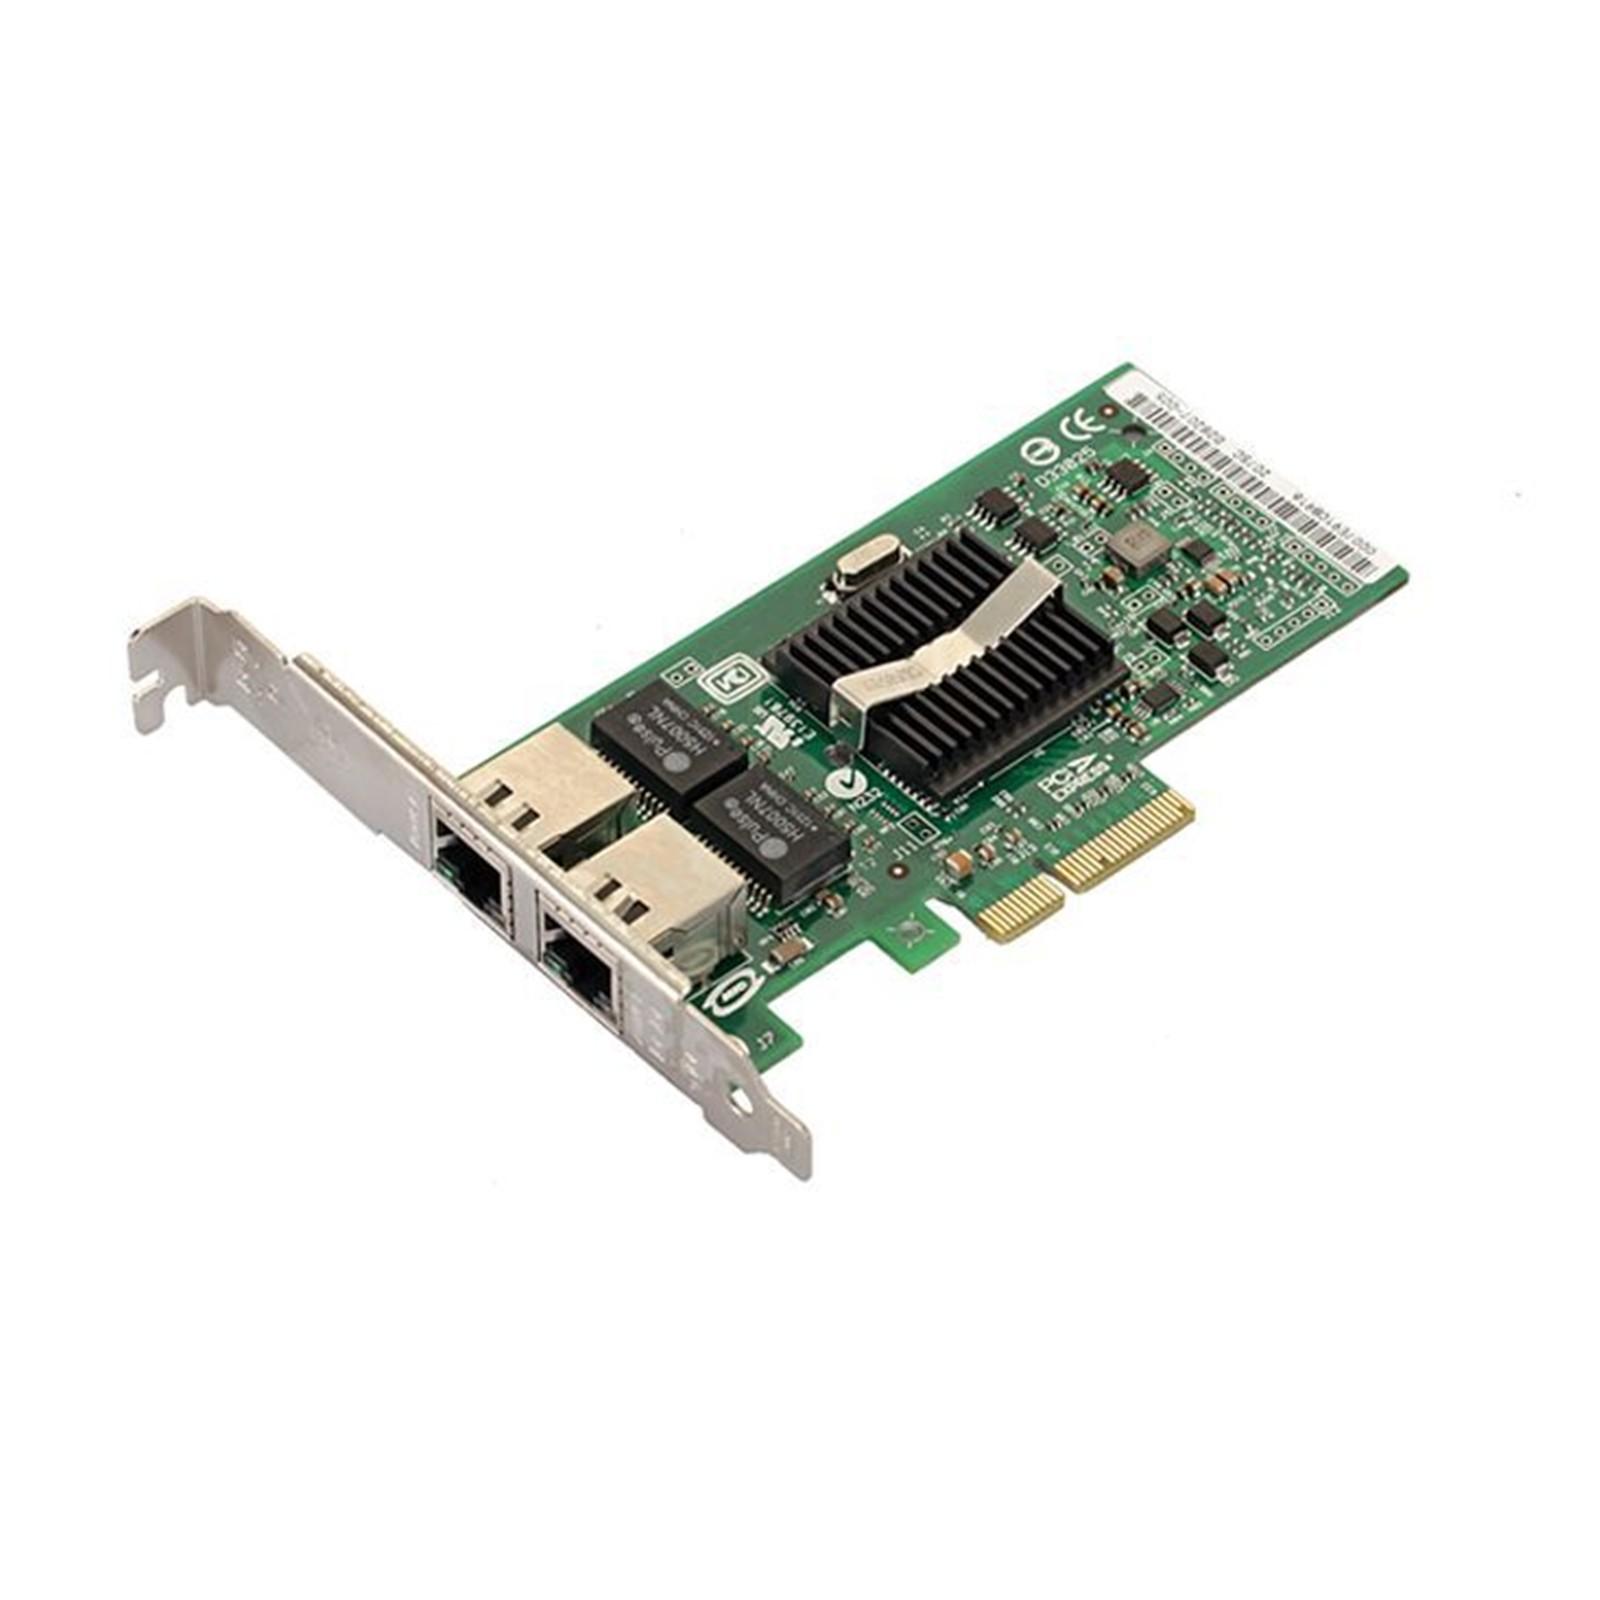 Buy the Intel PRO/1000 PT Dual Port Server Adapter PCI-E x4